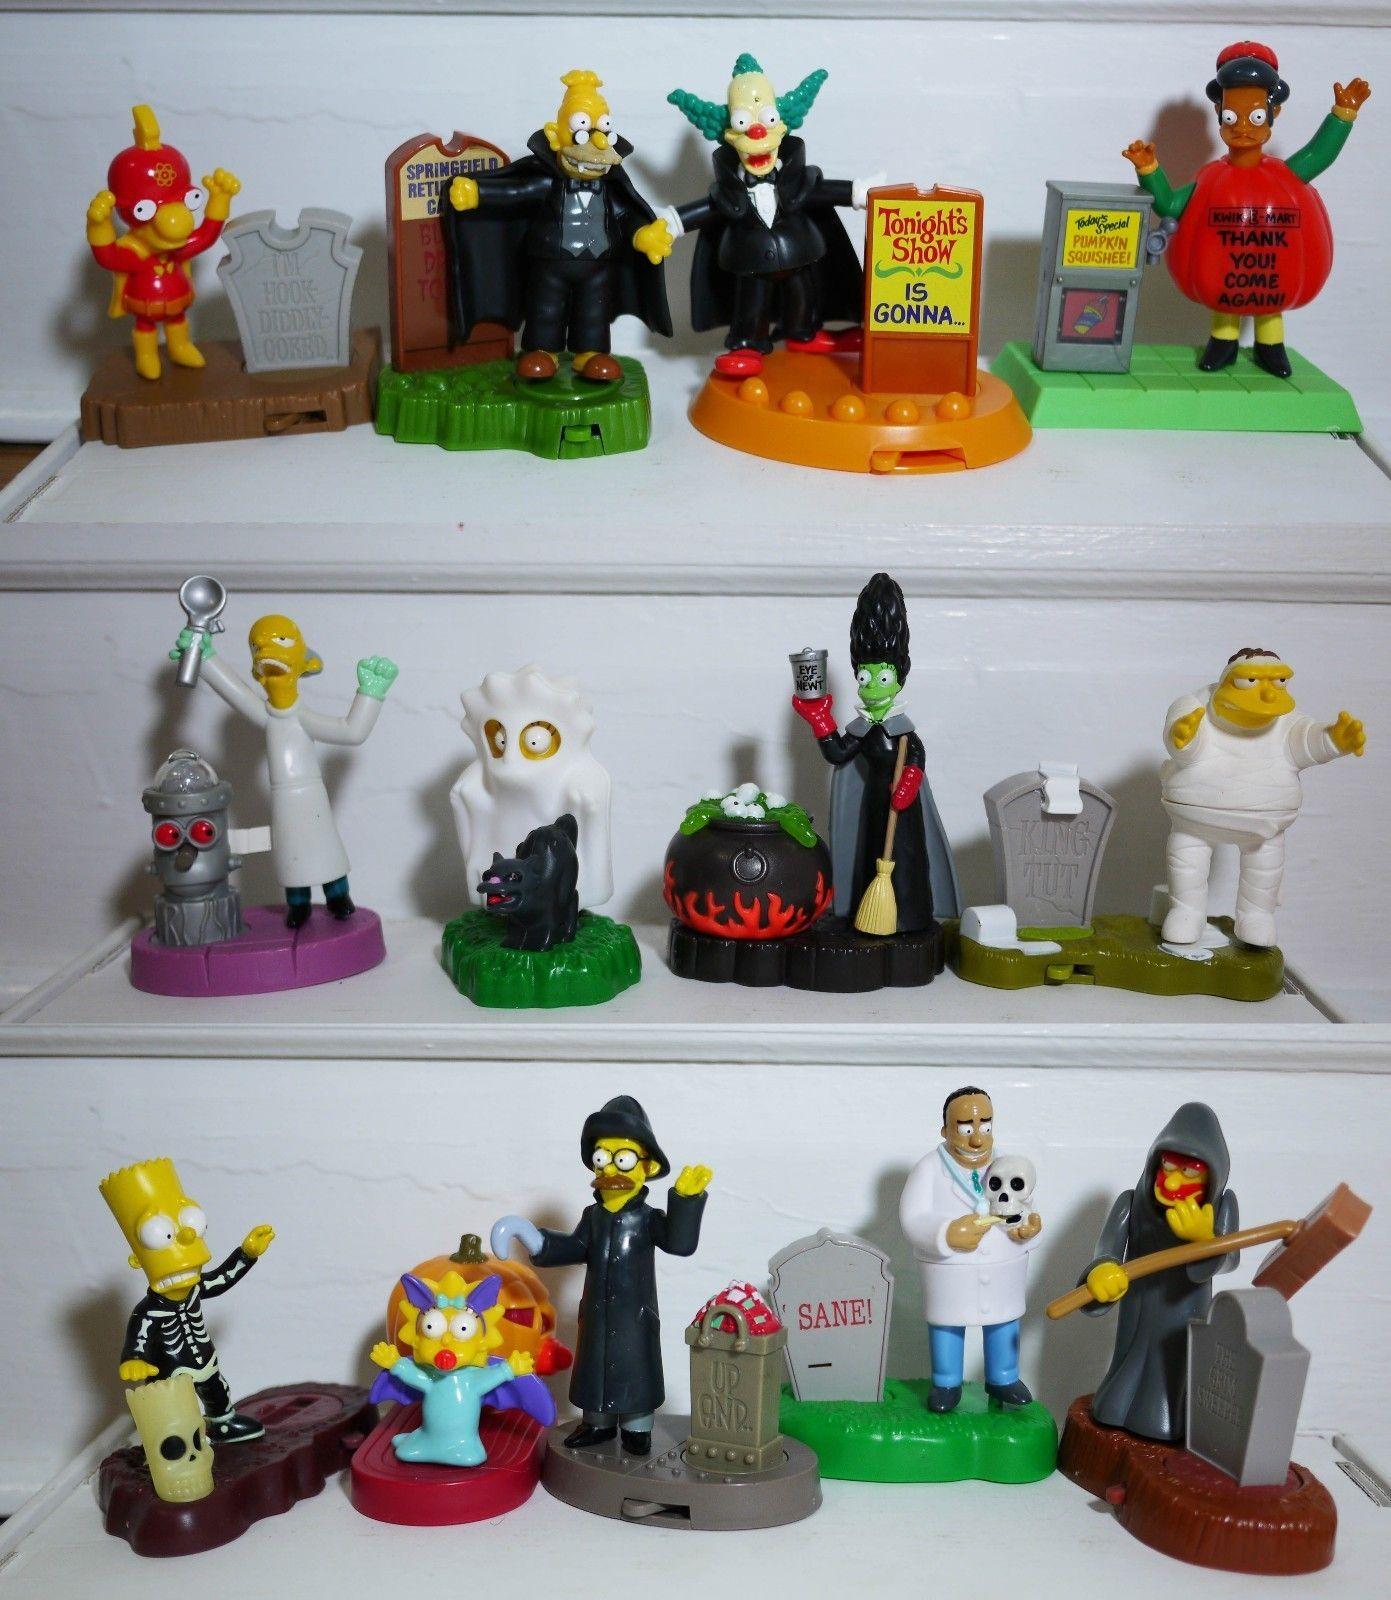 Halloween Burger King Toys The Simpsons